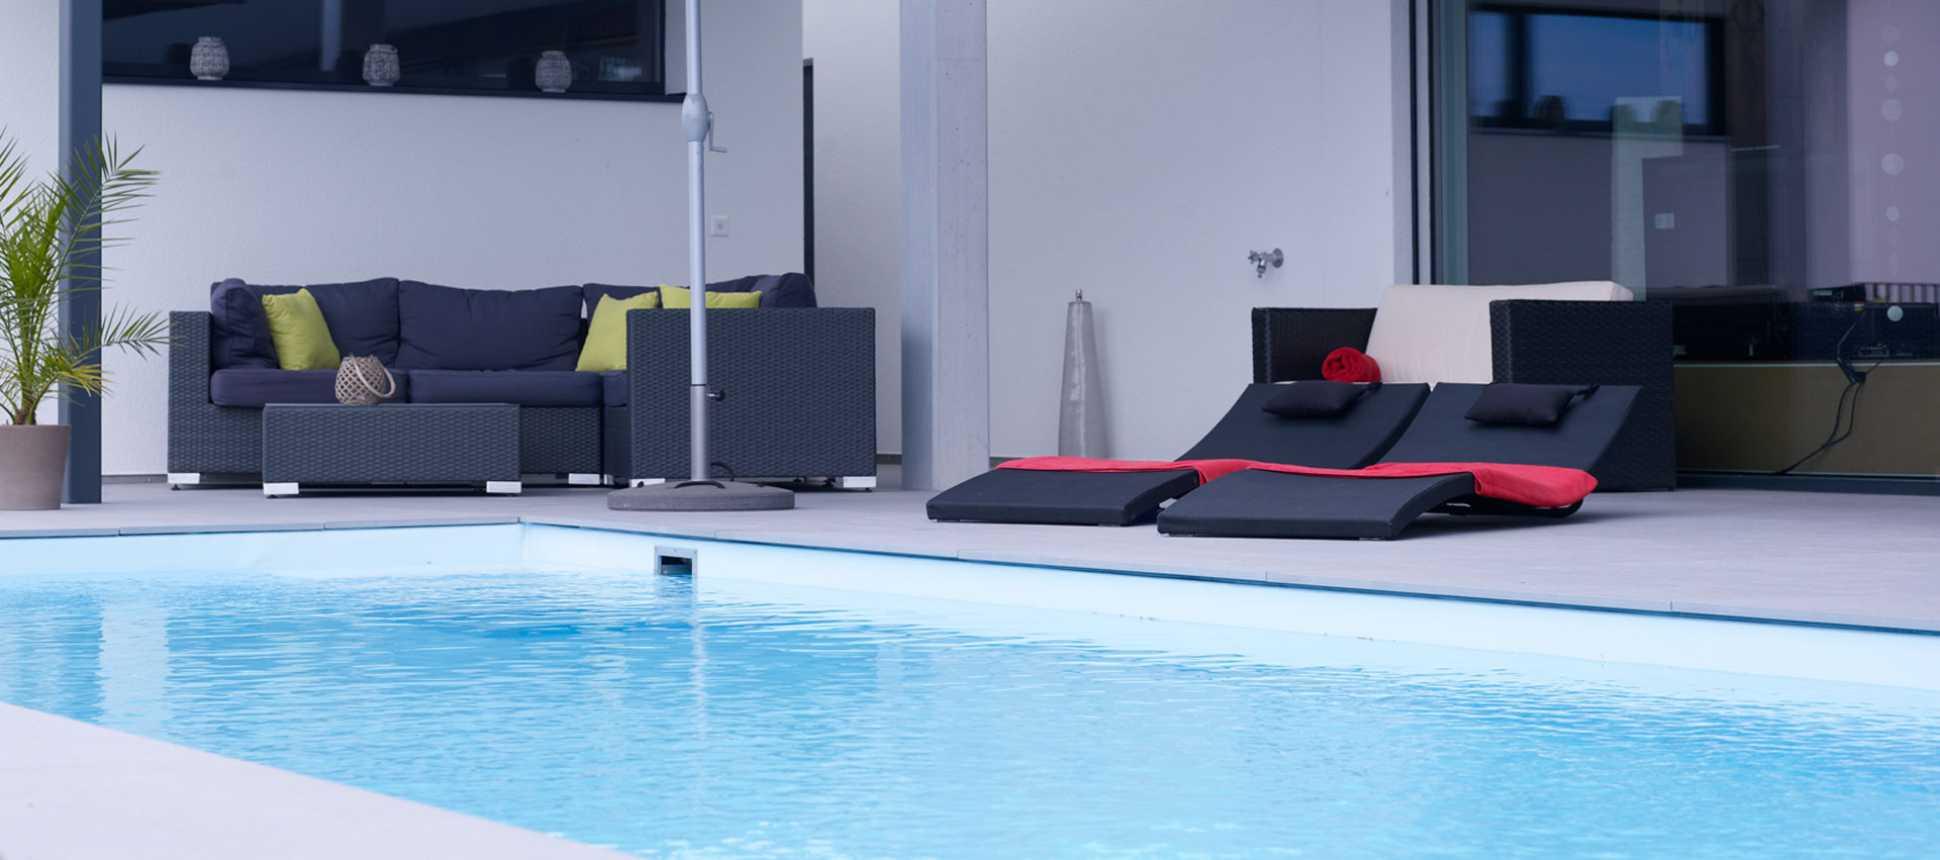 Swimmingpool mit Lounge